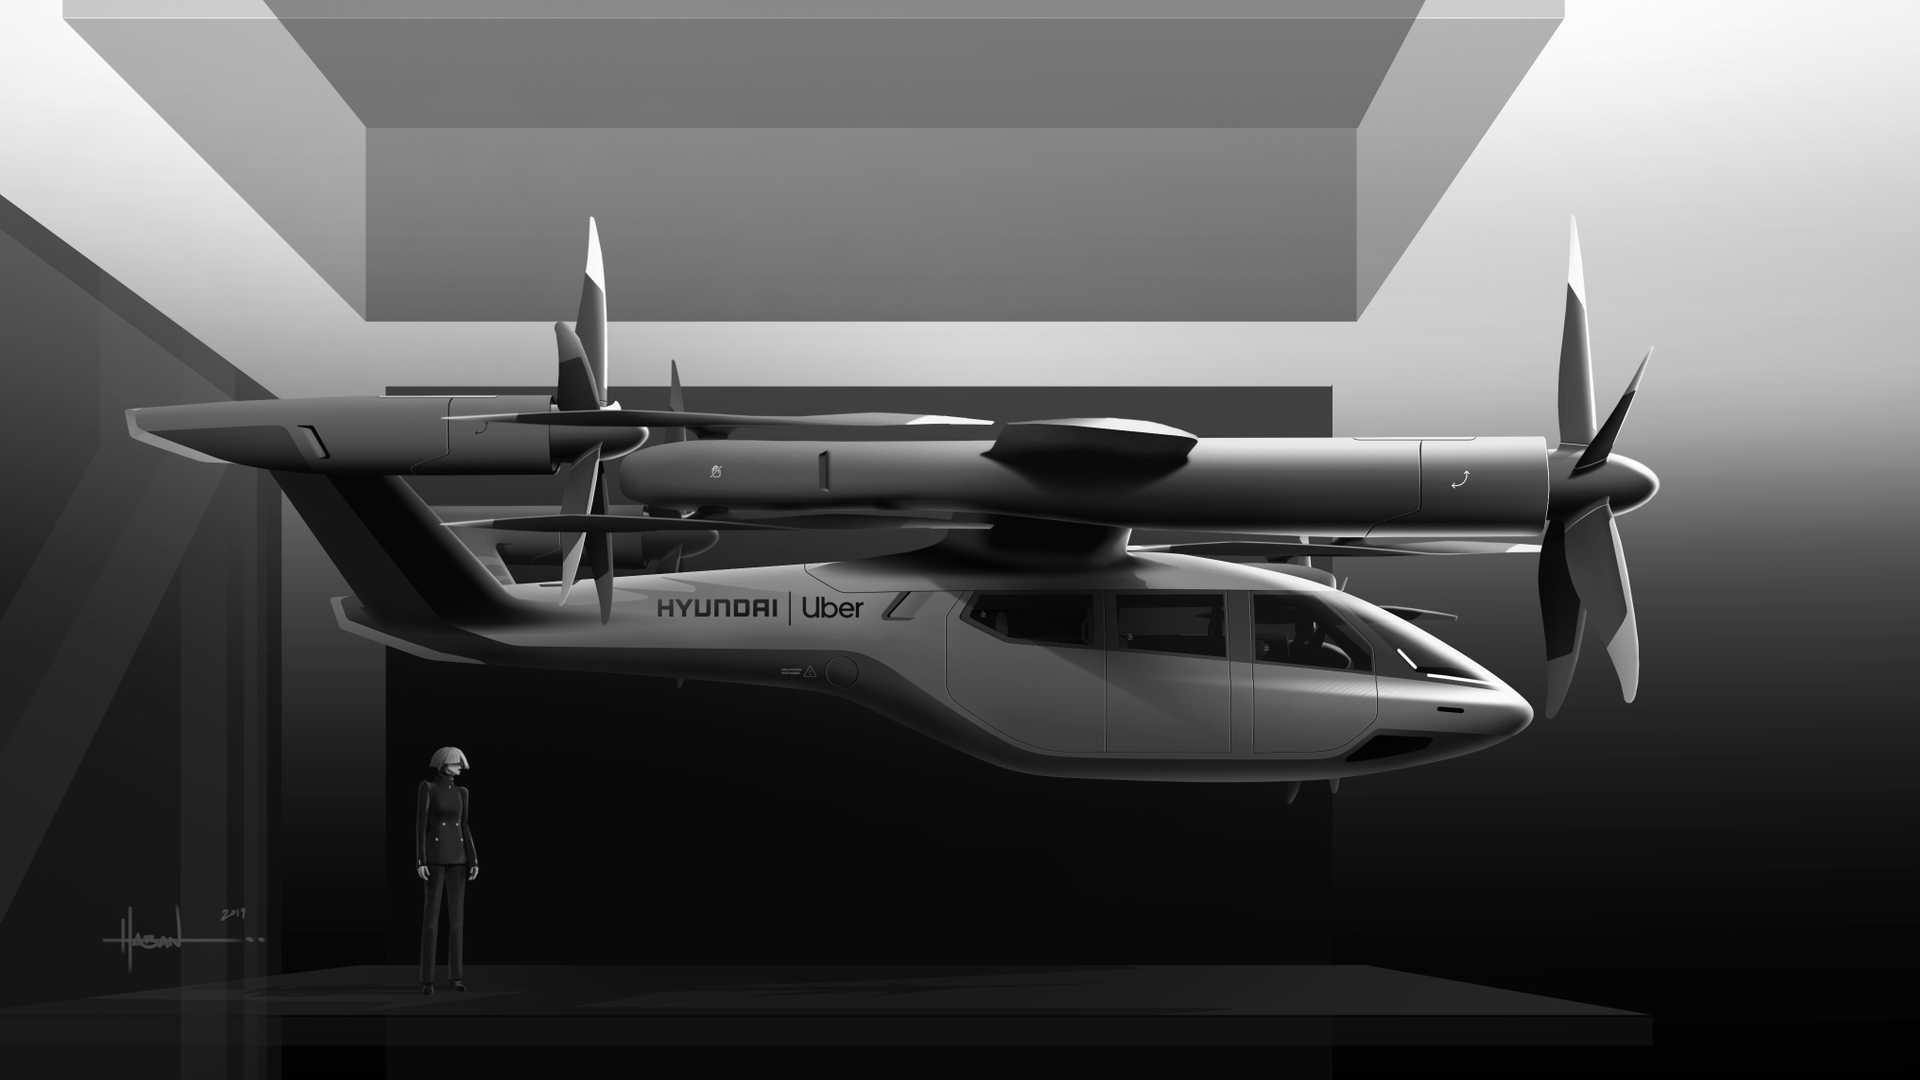 hyundai-uber-ridshare-air-taxi-concept-5